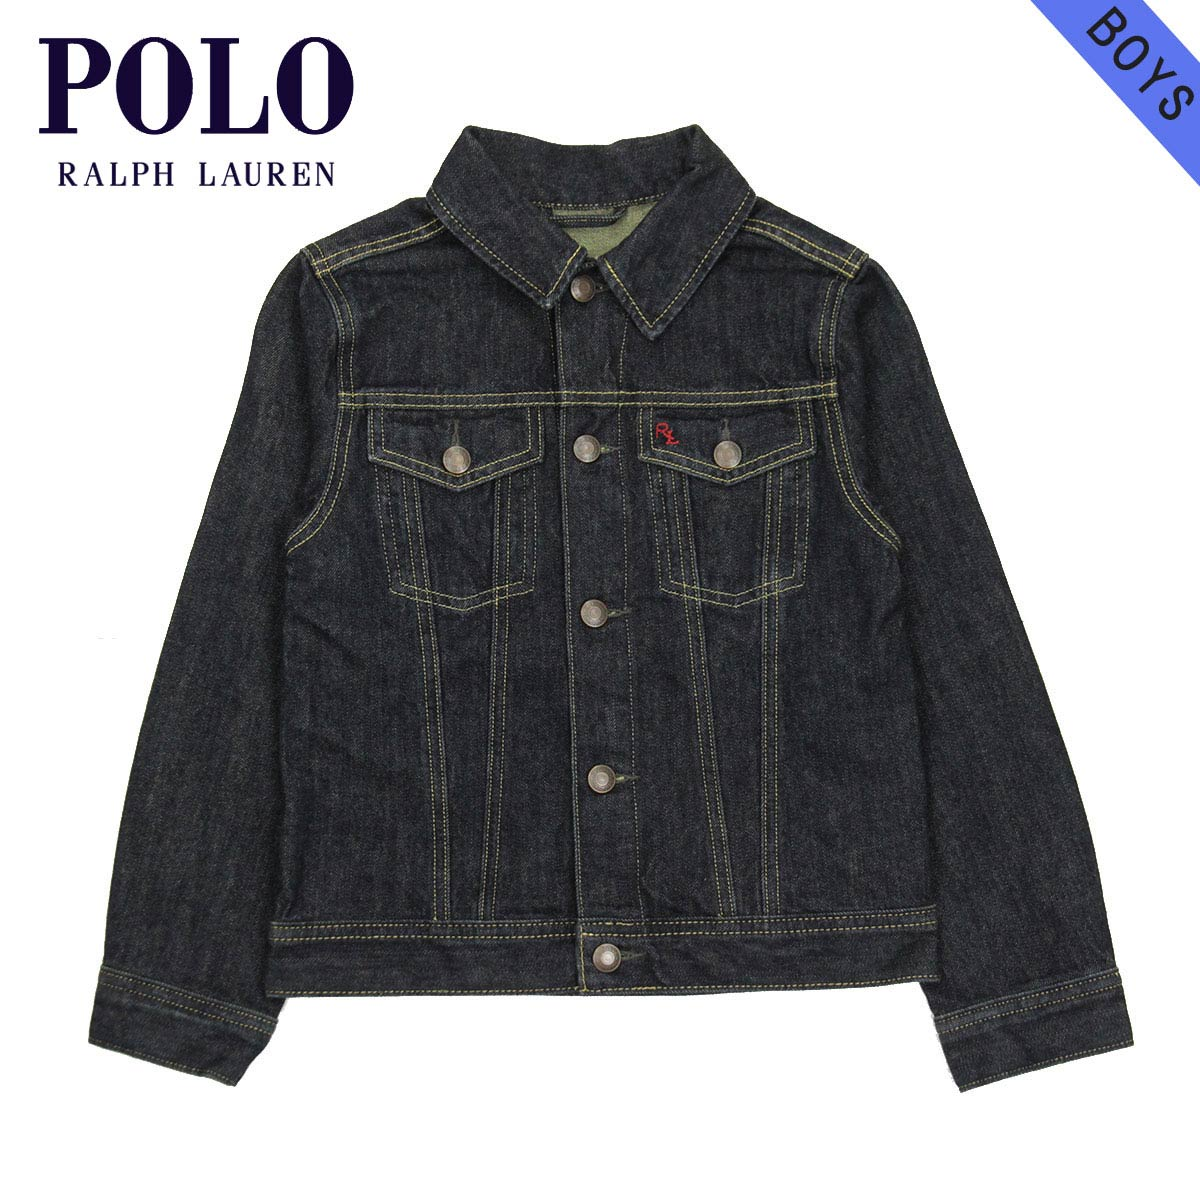 65db86d13260 Poloralflorenkids POLO RALPH LAUREN CHILDREN genuine kids clothing boys  jacket Classic Trucker Jean Jacket  22358446 NAVY 10P22Jul14